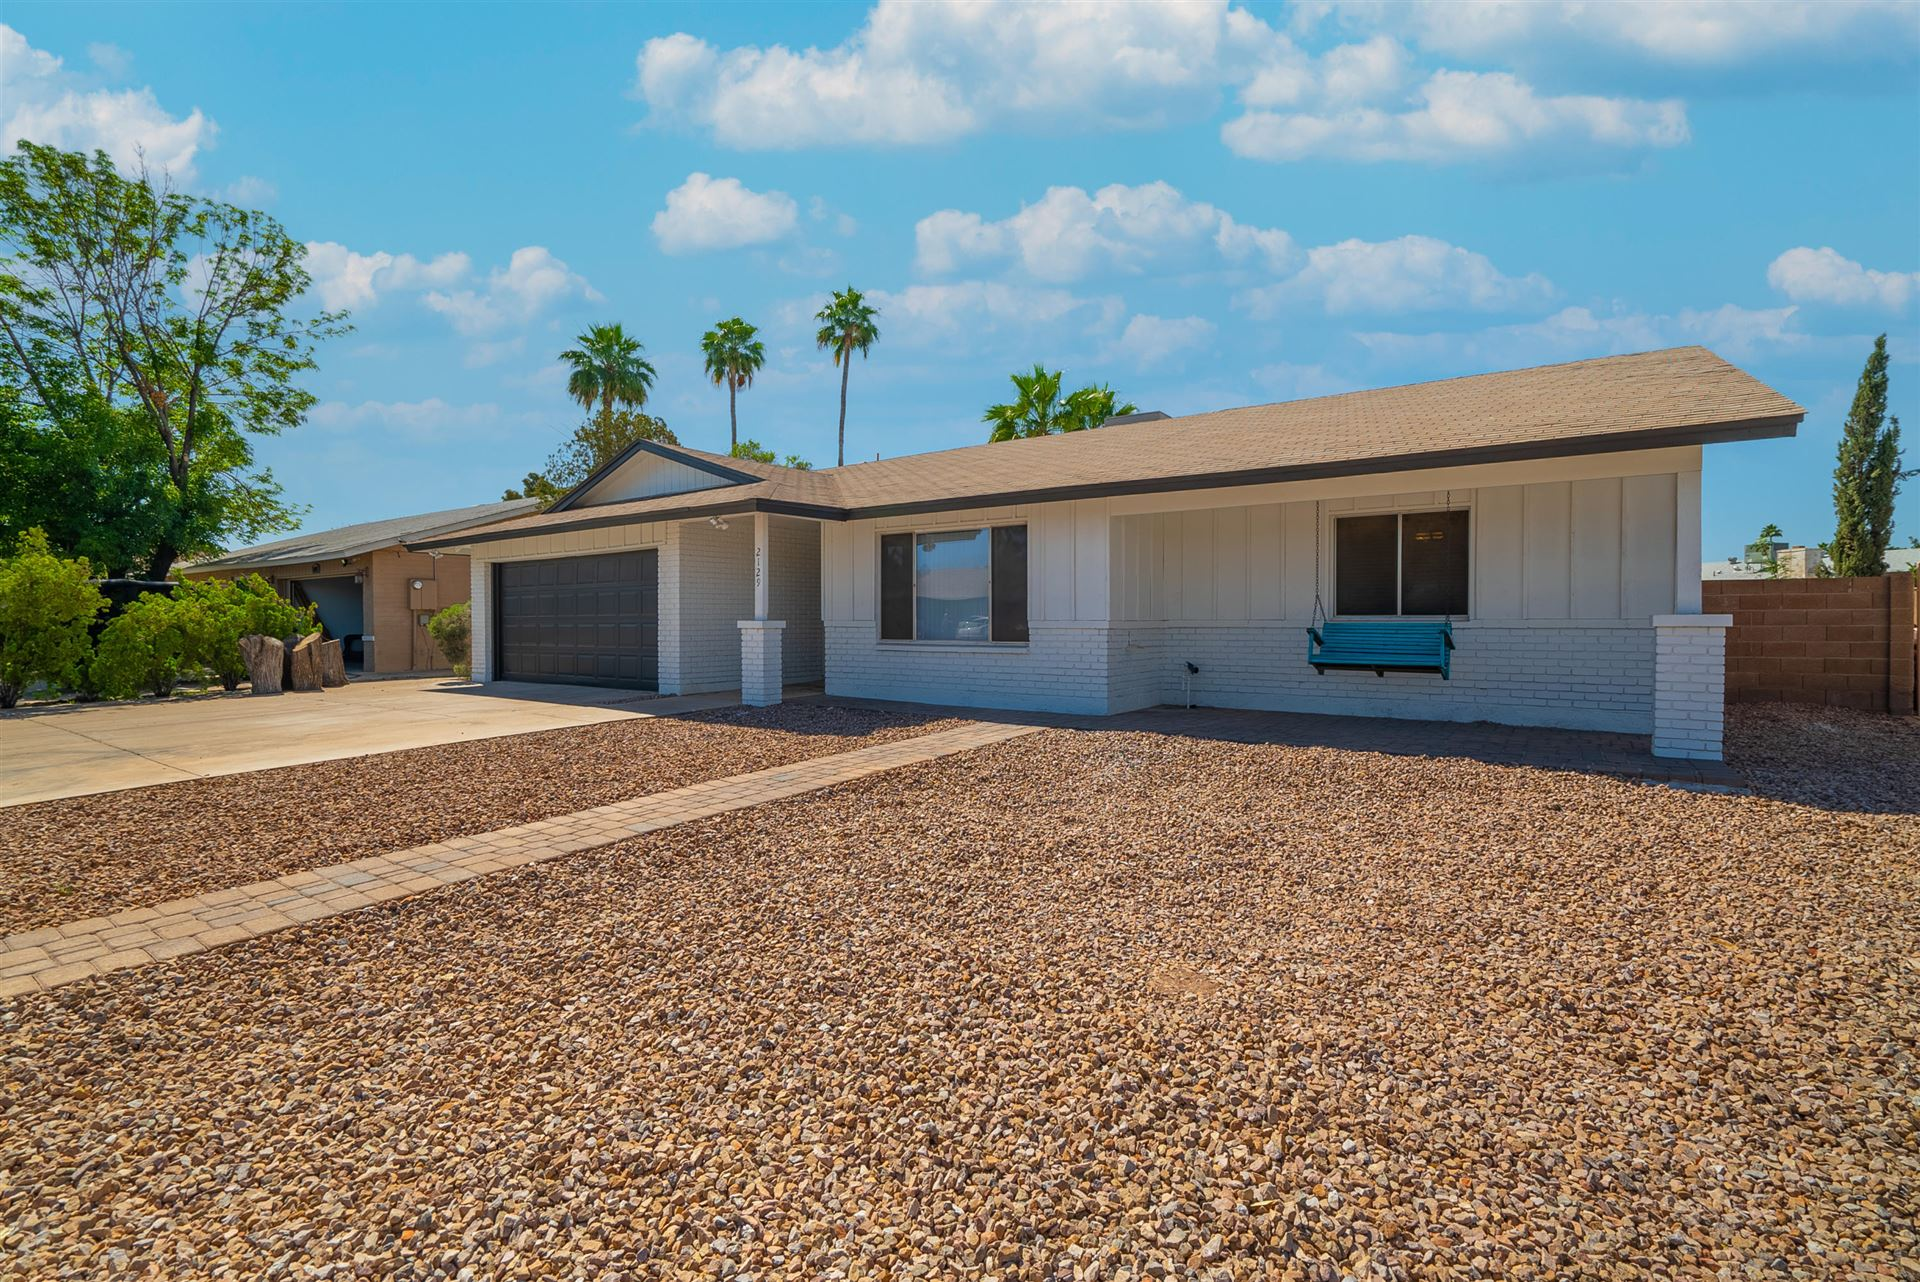 2129 E APOLLO Avenue, Tempe, AZ 85283 - MLS#: 6231862